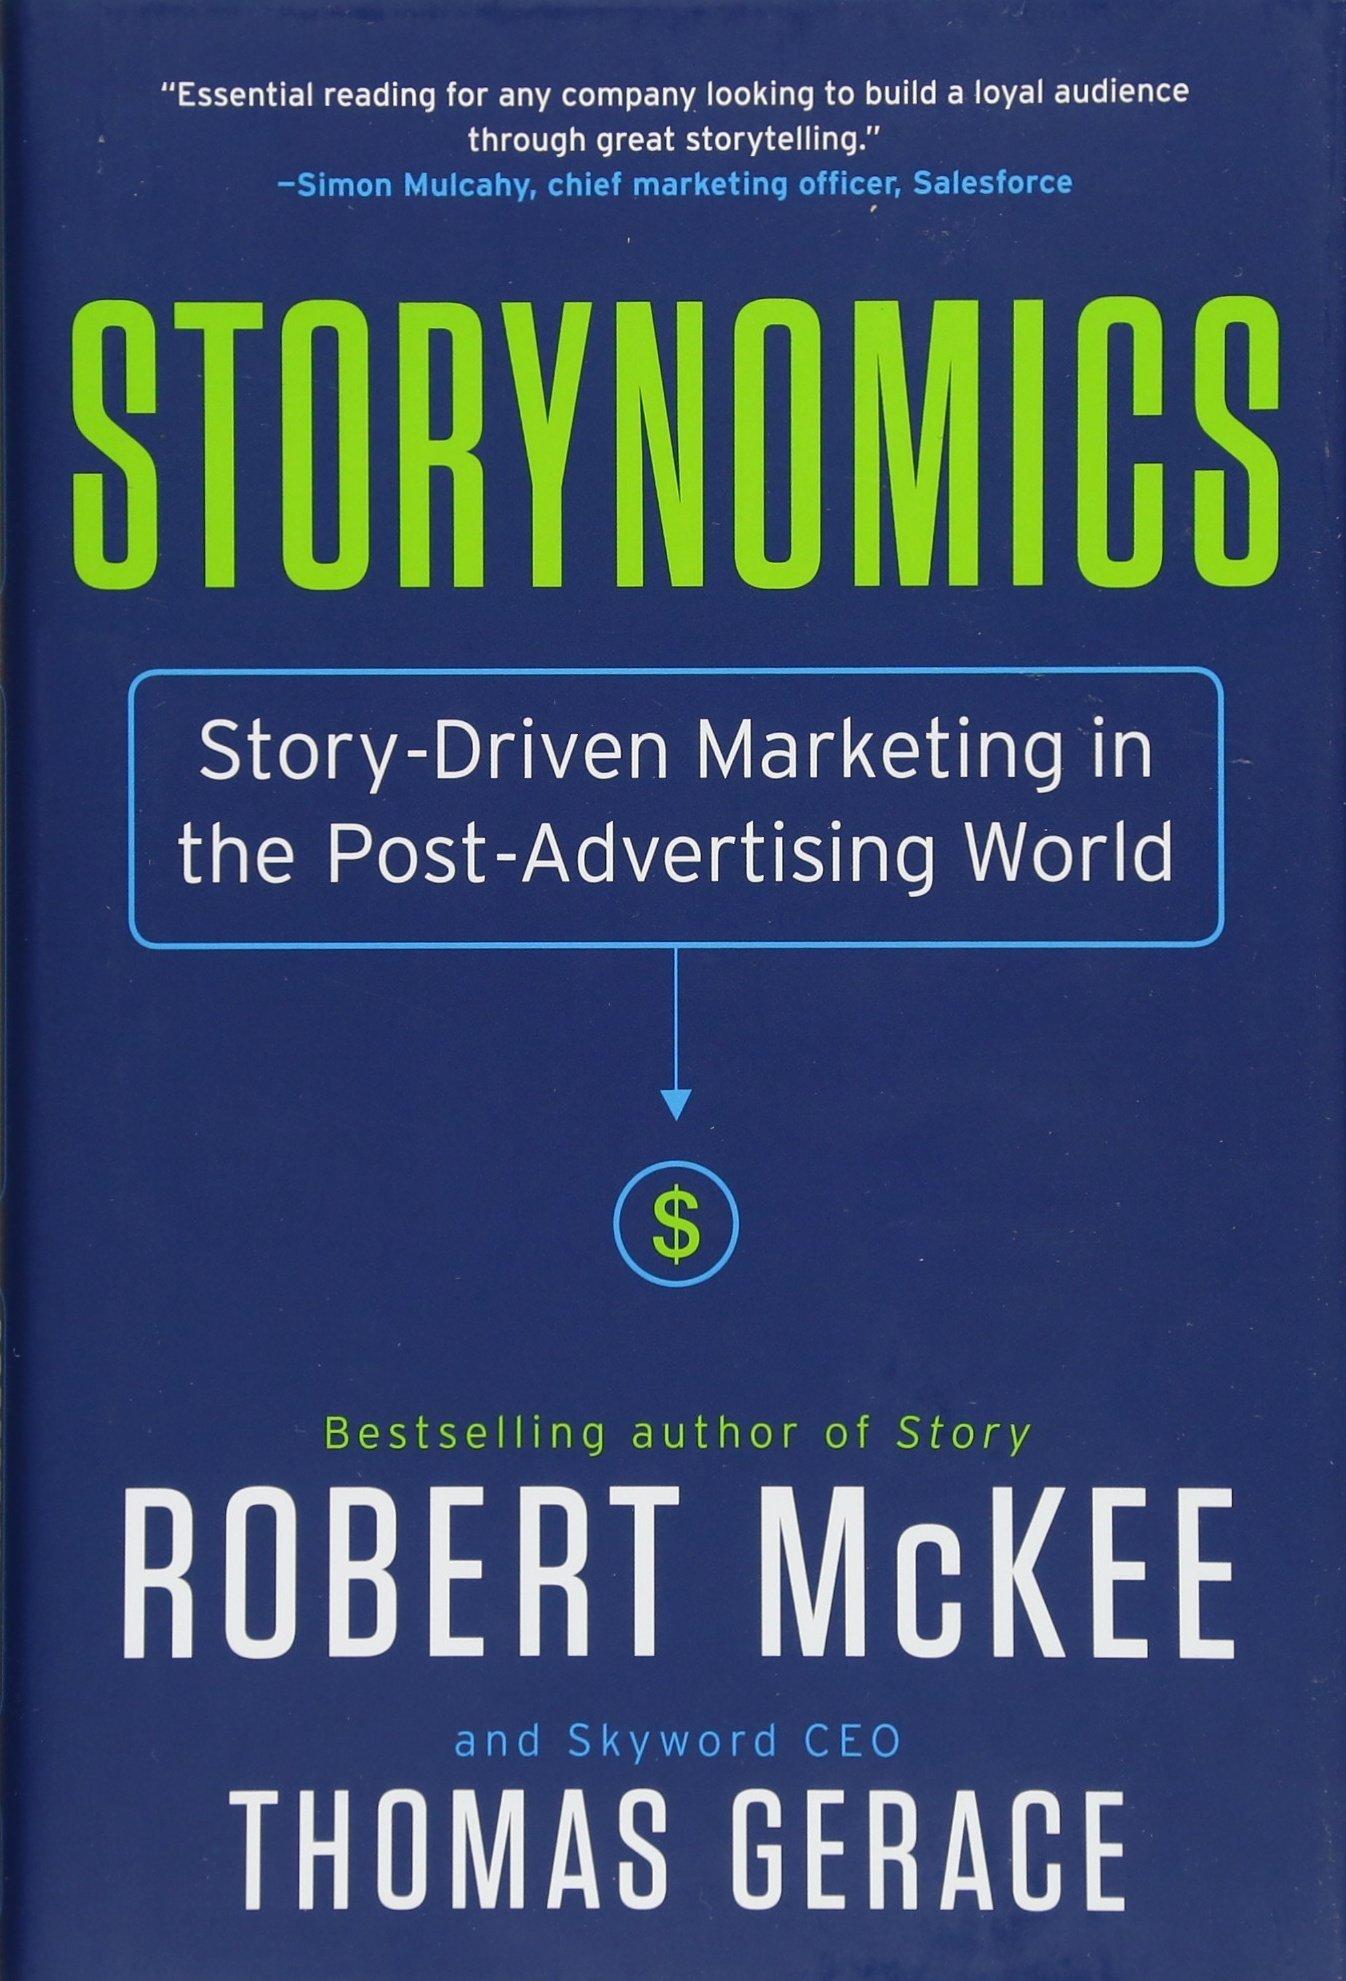 https://www.amazon.com/Storynomics-Story-Driven-Marketing-Post-Advertising-World/dp/1538727935